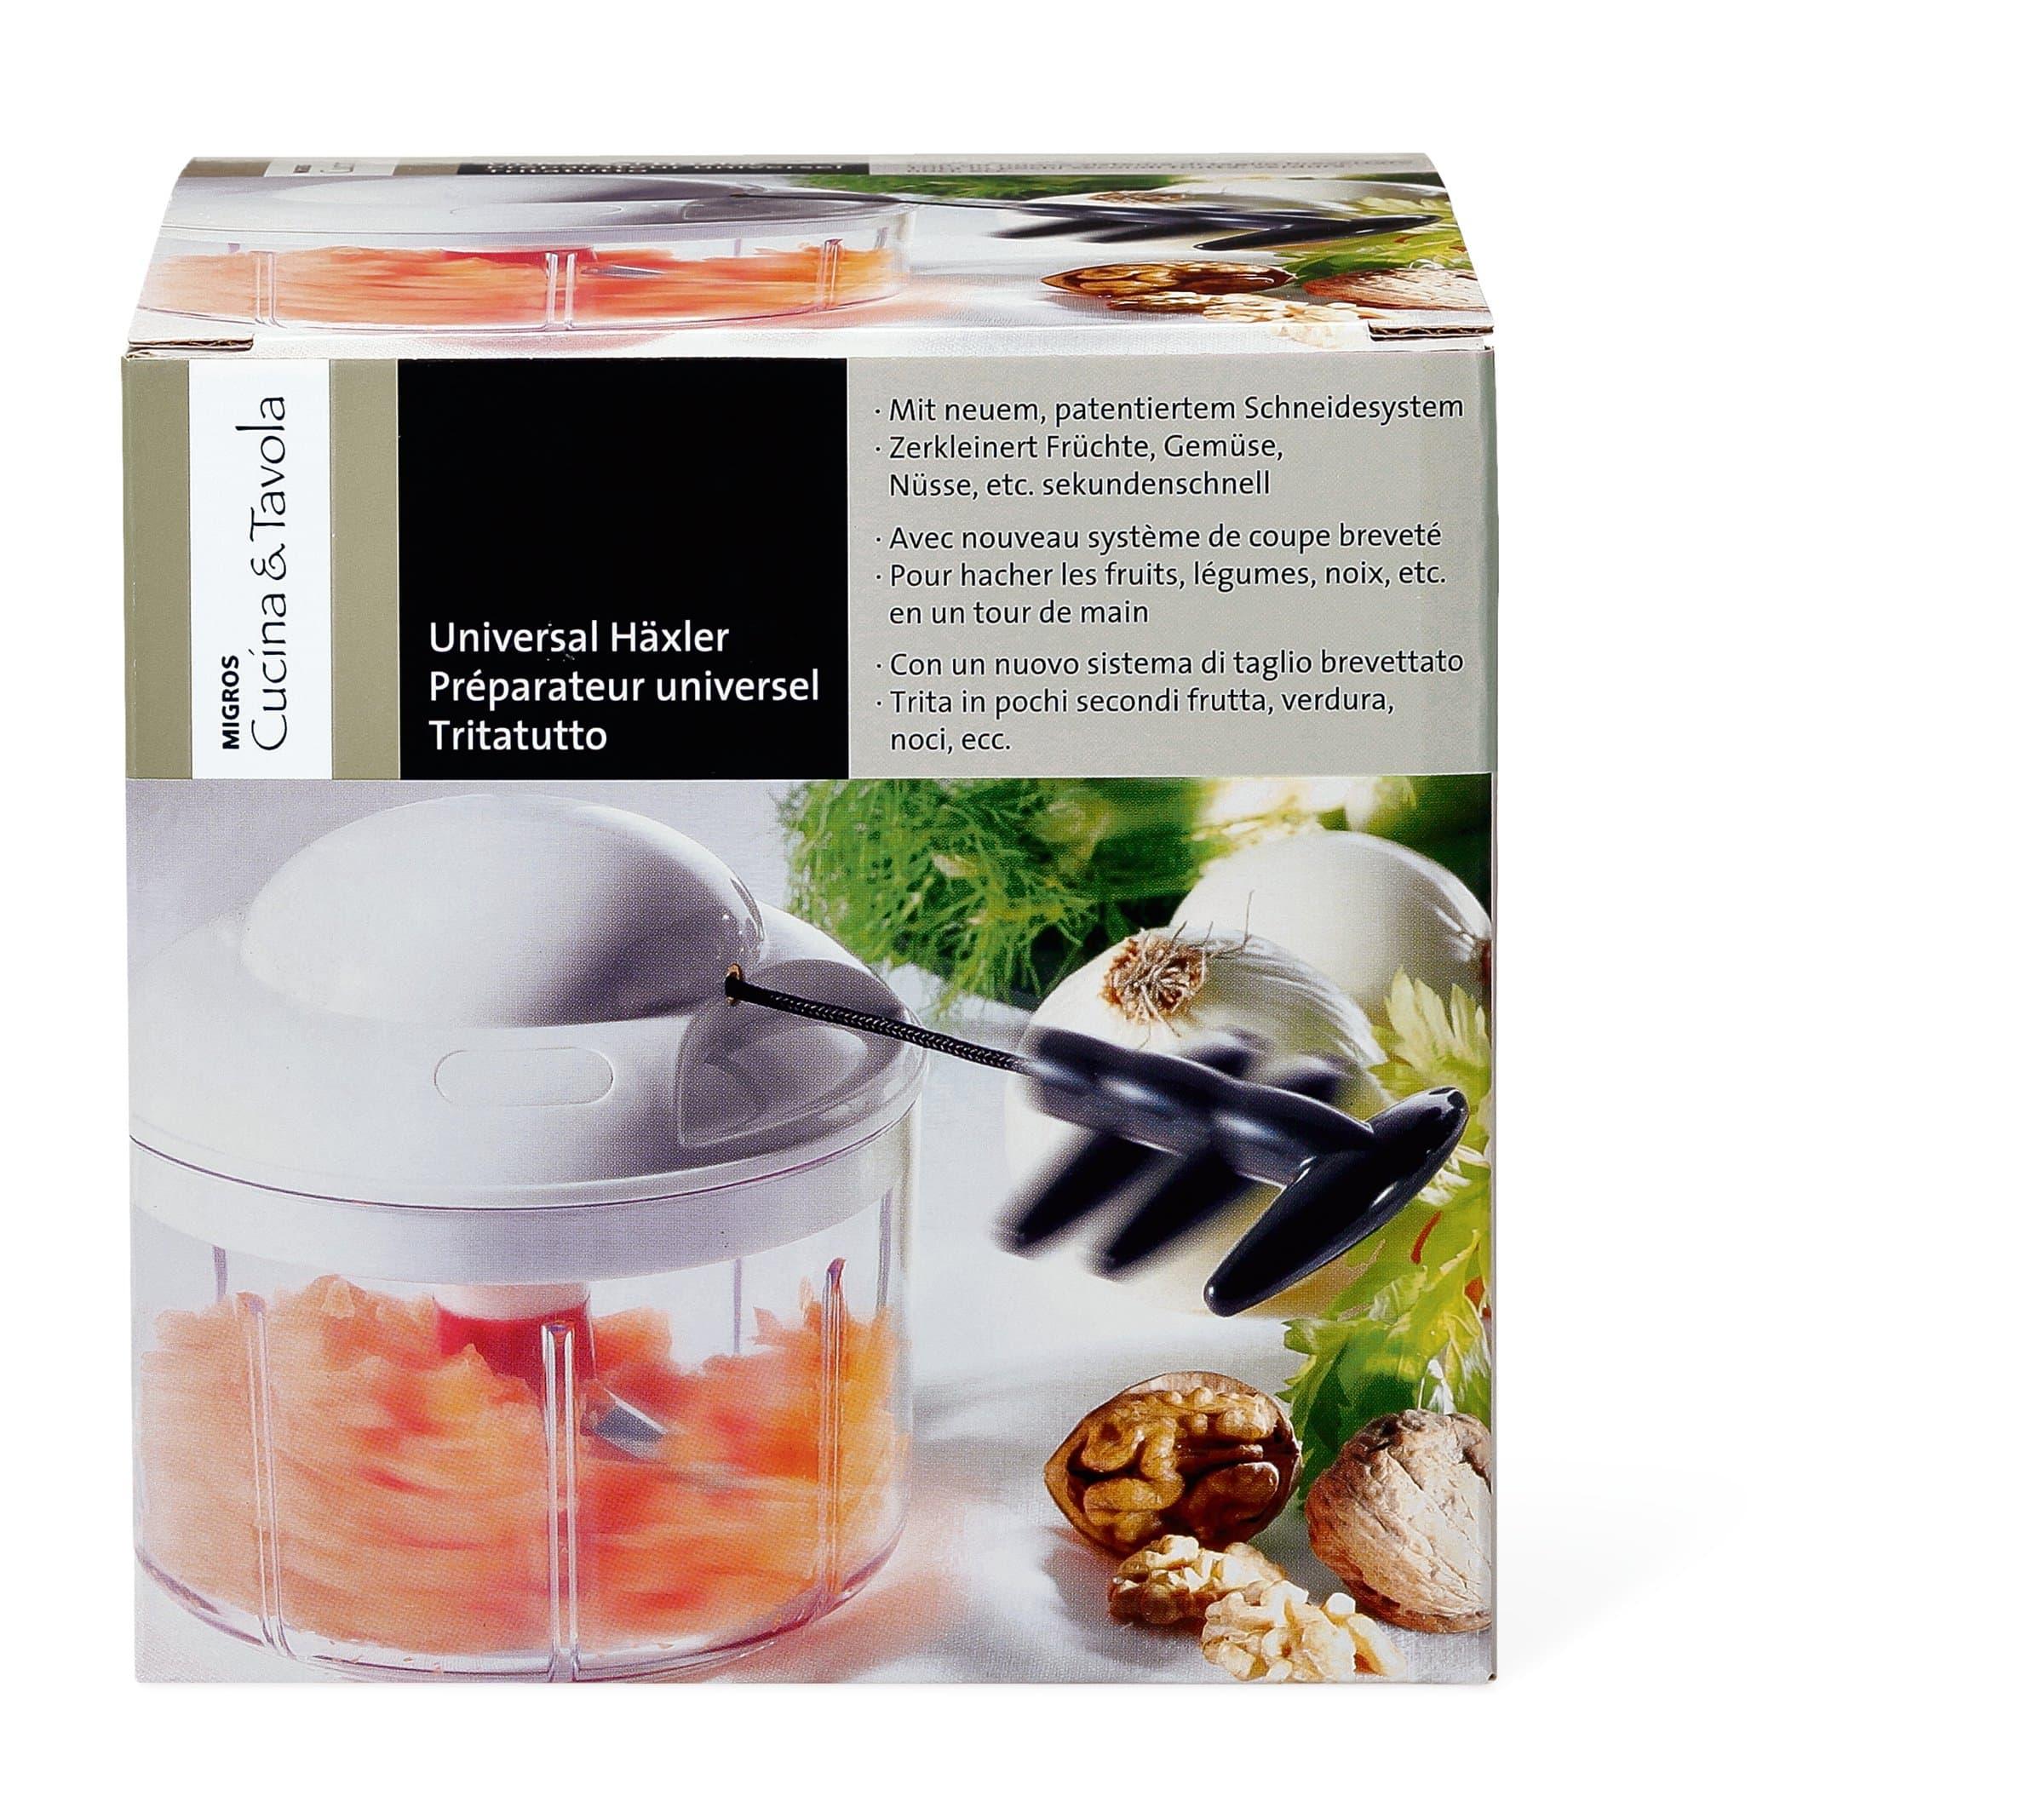 Cucina & Tavola CUCINA & TAVOLA Universal Häxler